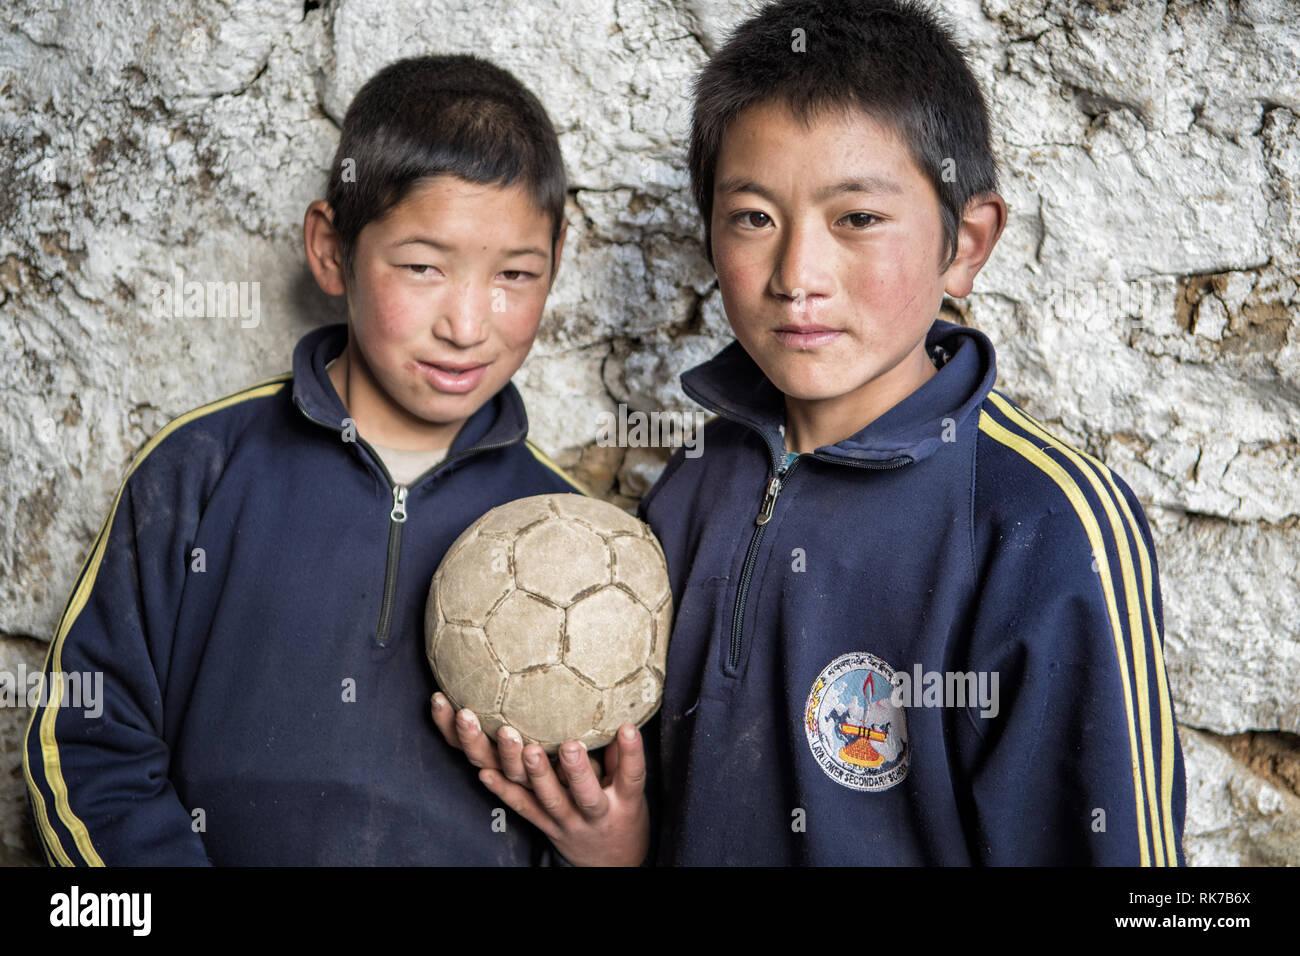 Two schoolchildren with a soccer ball in Laya, Gasa District, Snowman Trek, Bhutan - Stock Image